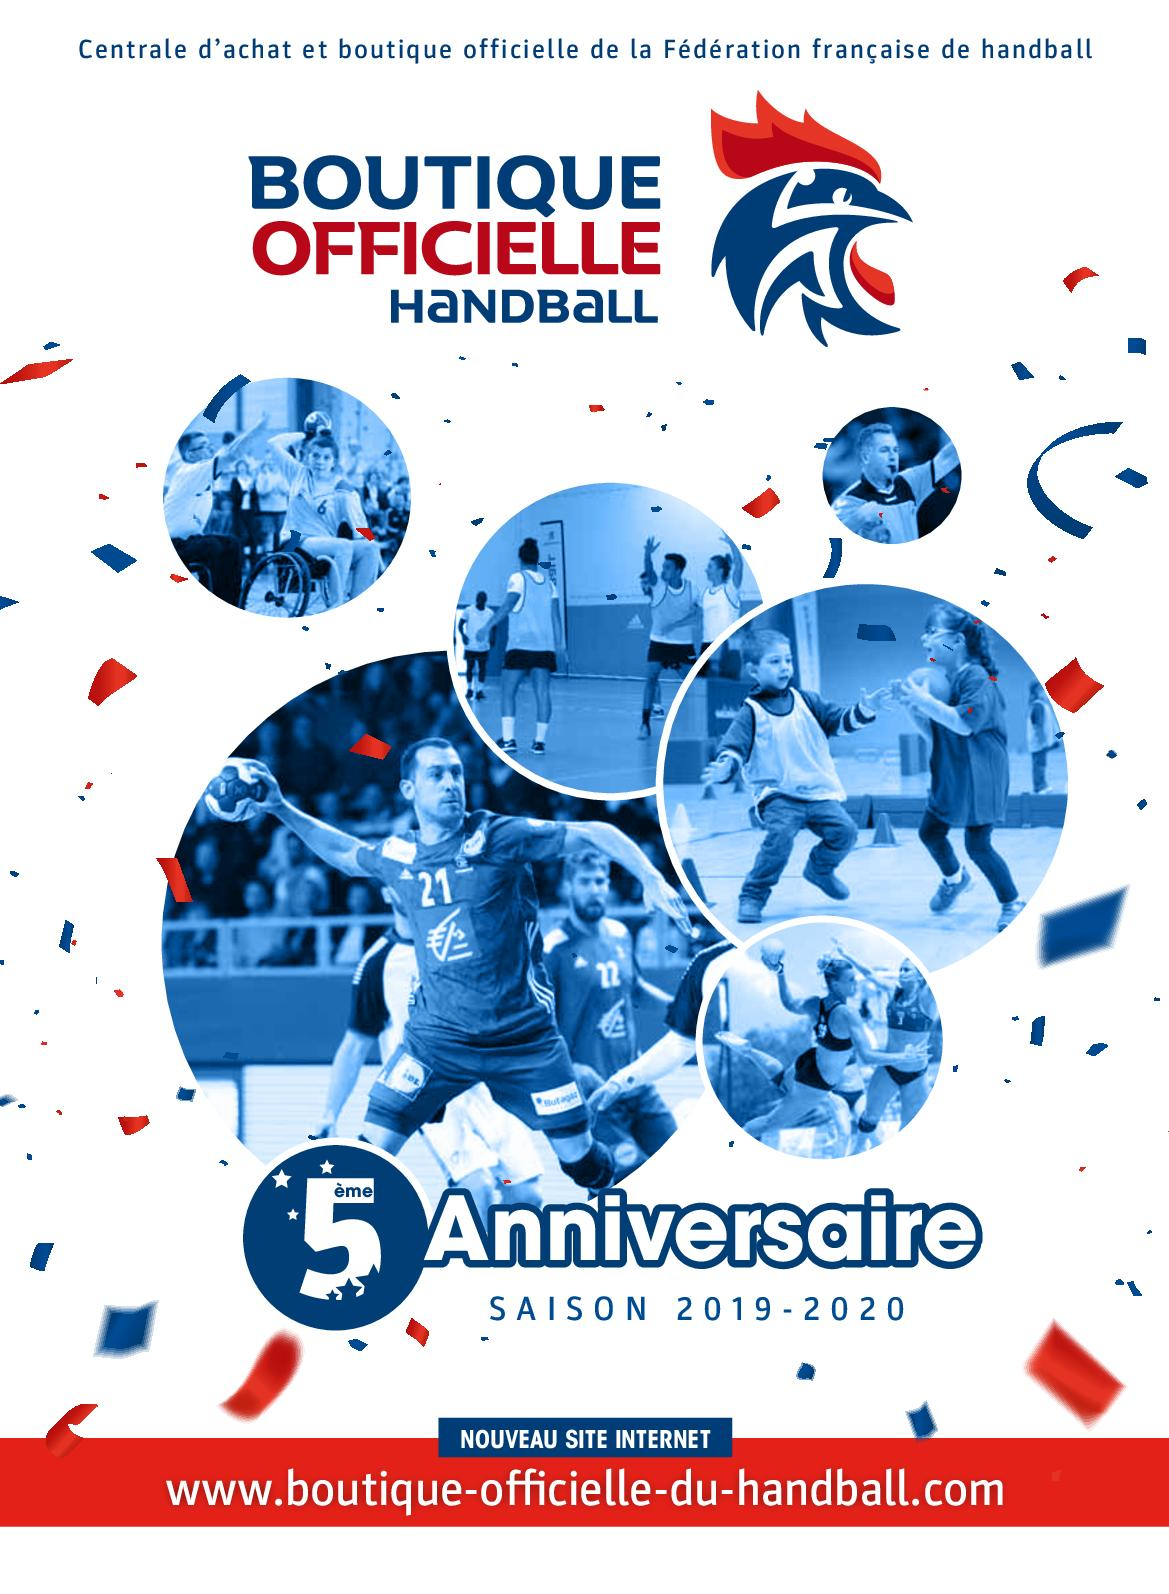 Evolution Handball CapuchehandballeurmatchtournoiSportTir